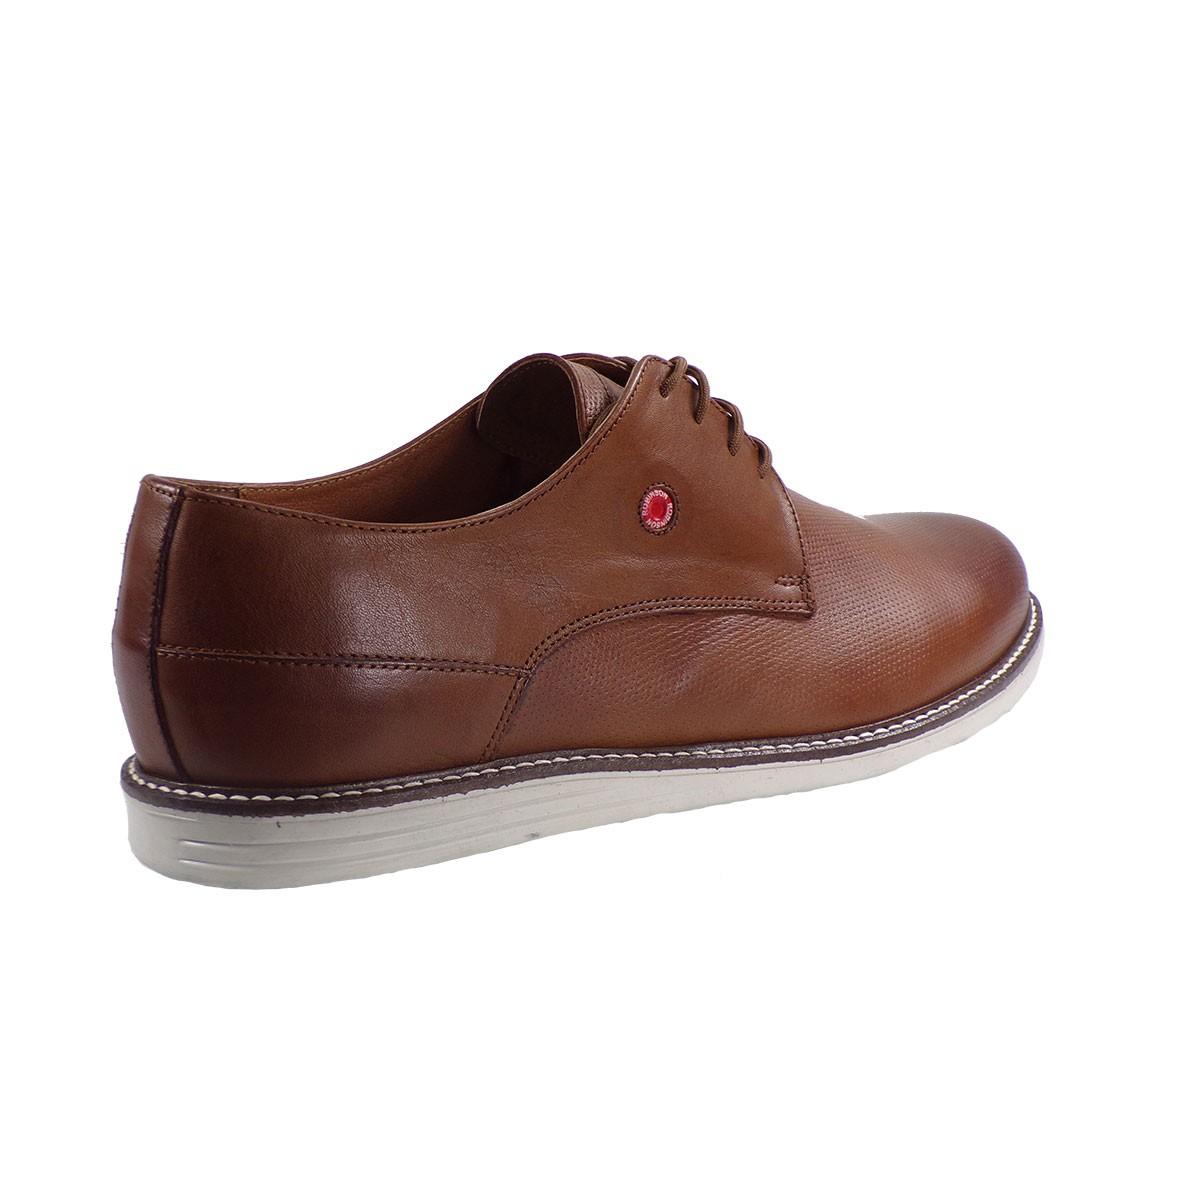 16cc31cd2e8 Αρχική σελίδα / Νέες Παραλαβές / Ανδρικά Παπούτσια